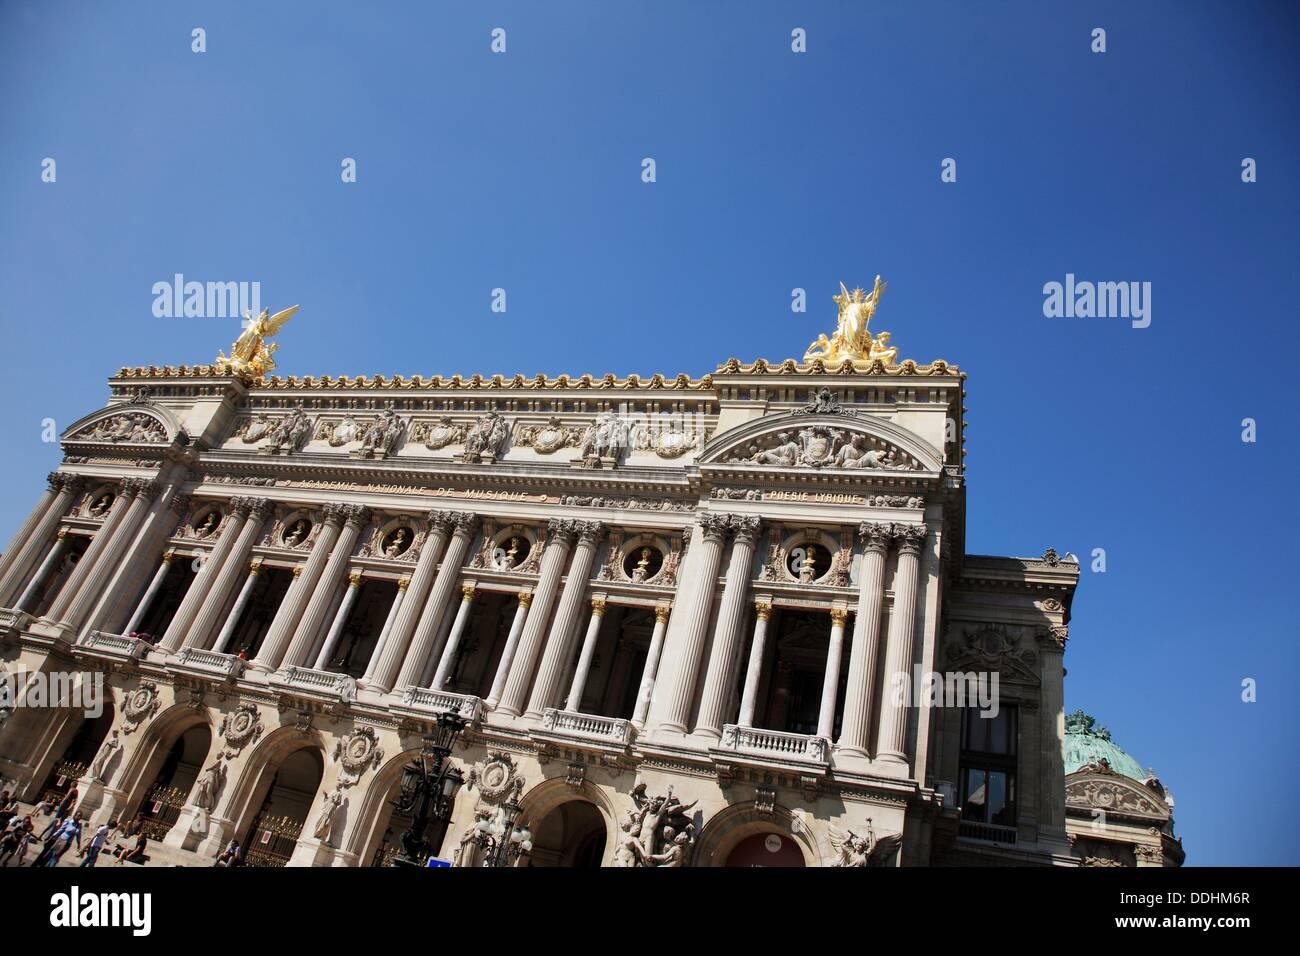 France, Paris, Garnier Opera House - Stock Image